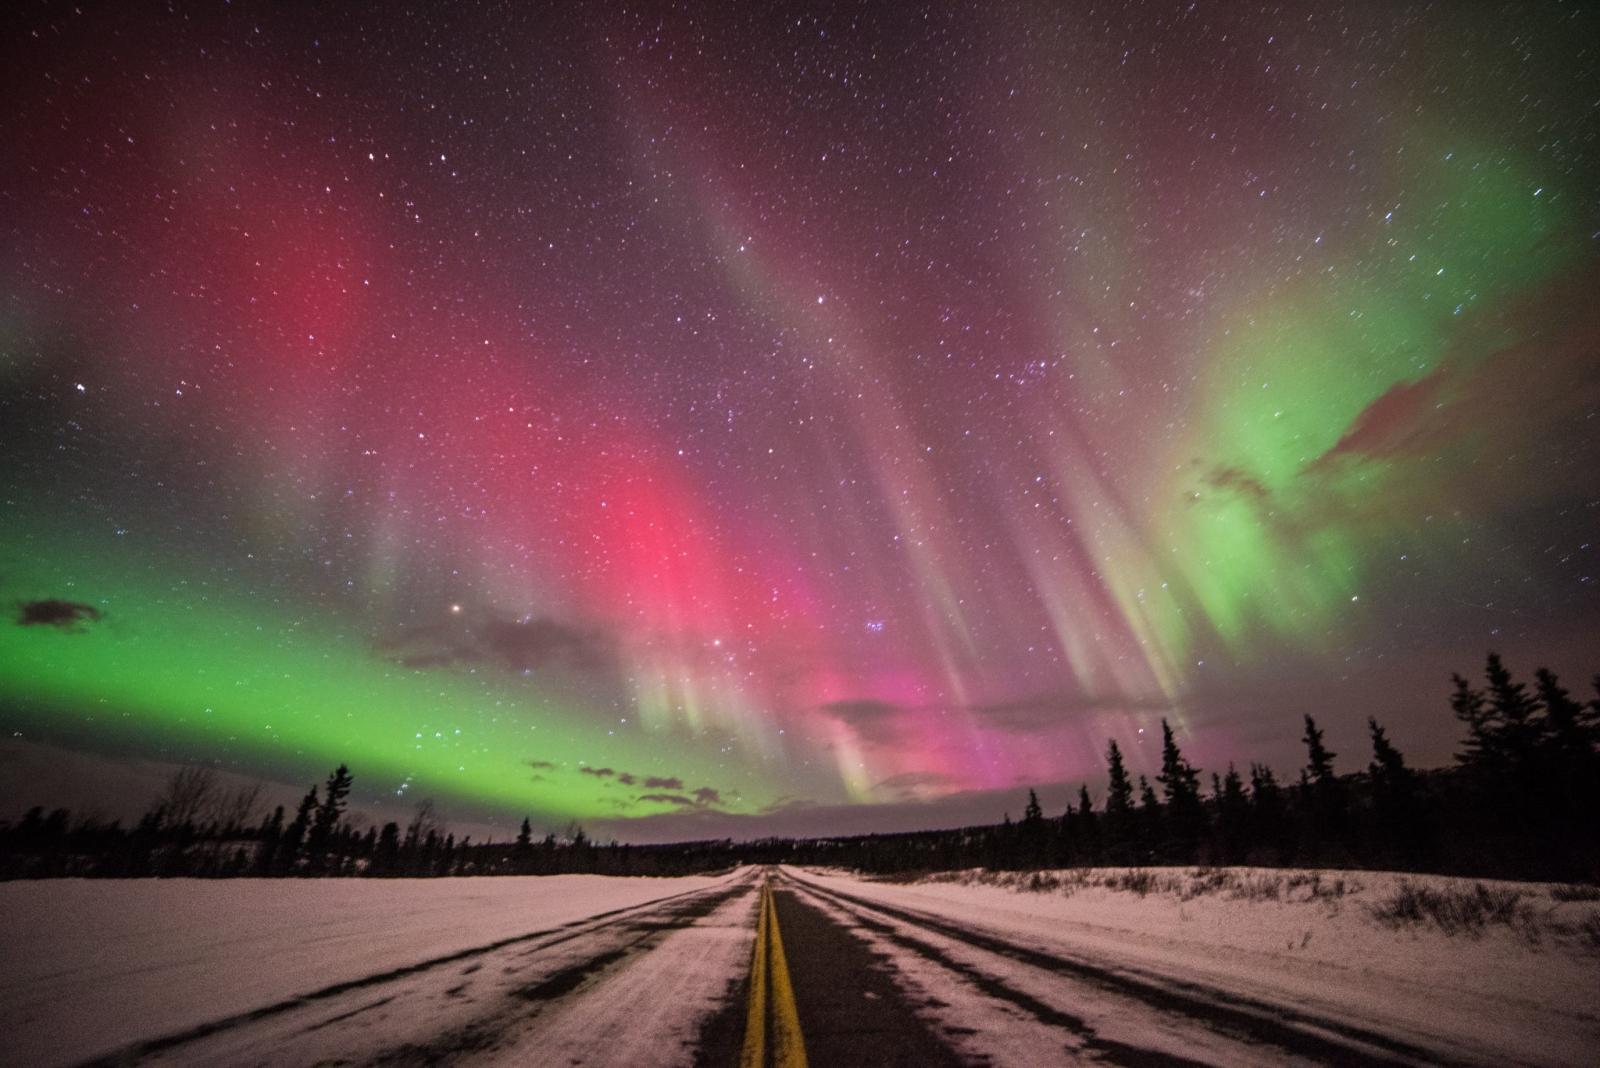 Aurora borealis photos of northern lights over alaska following